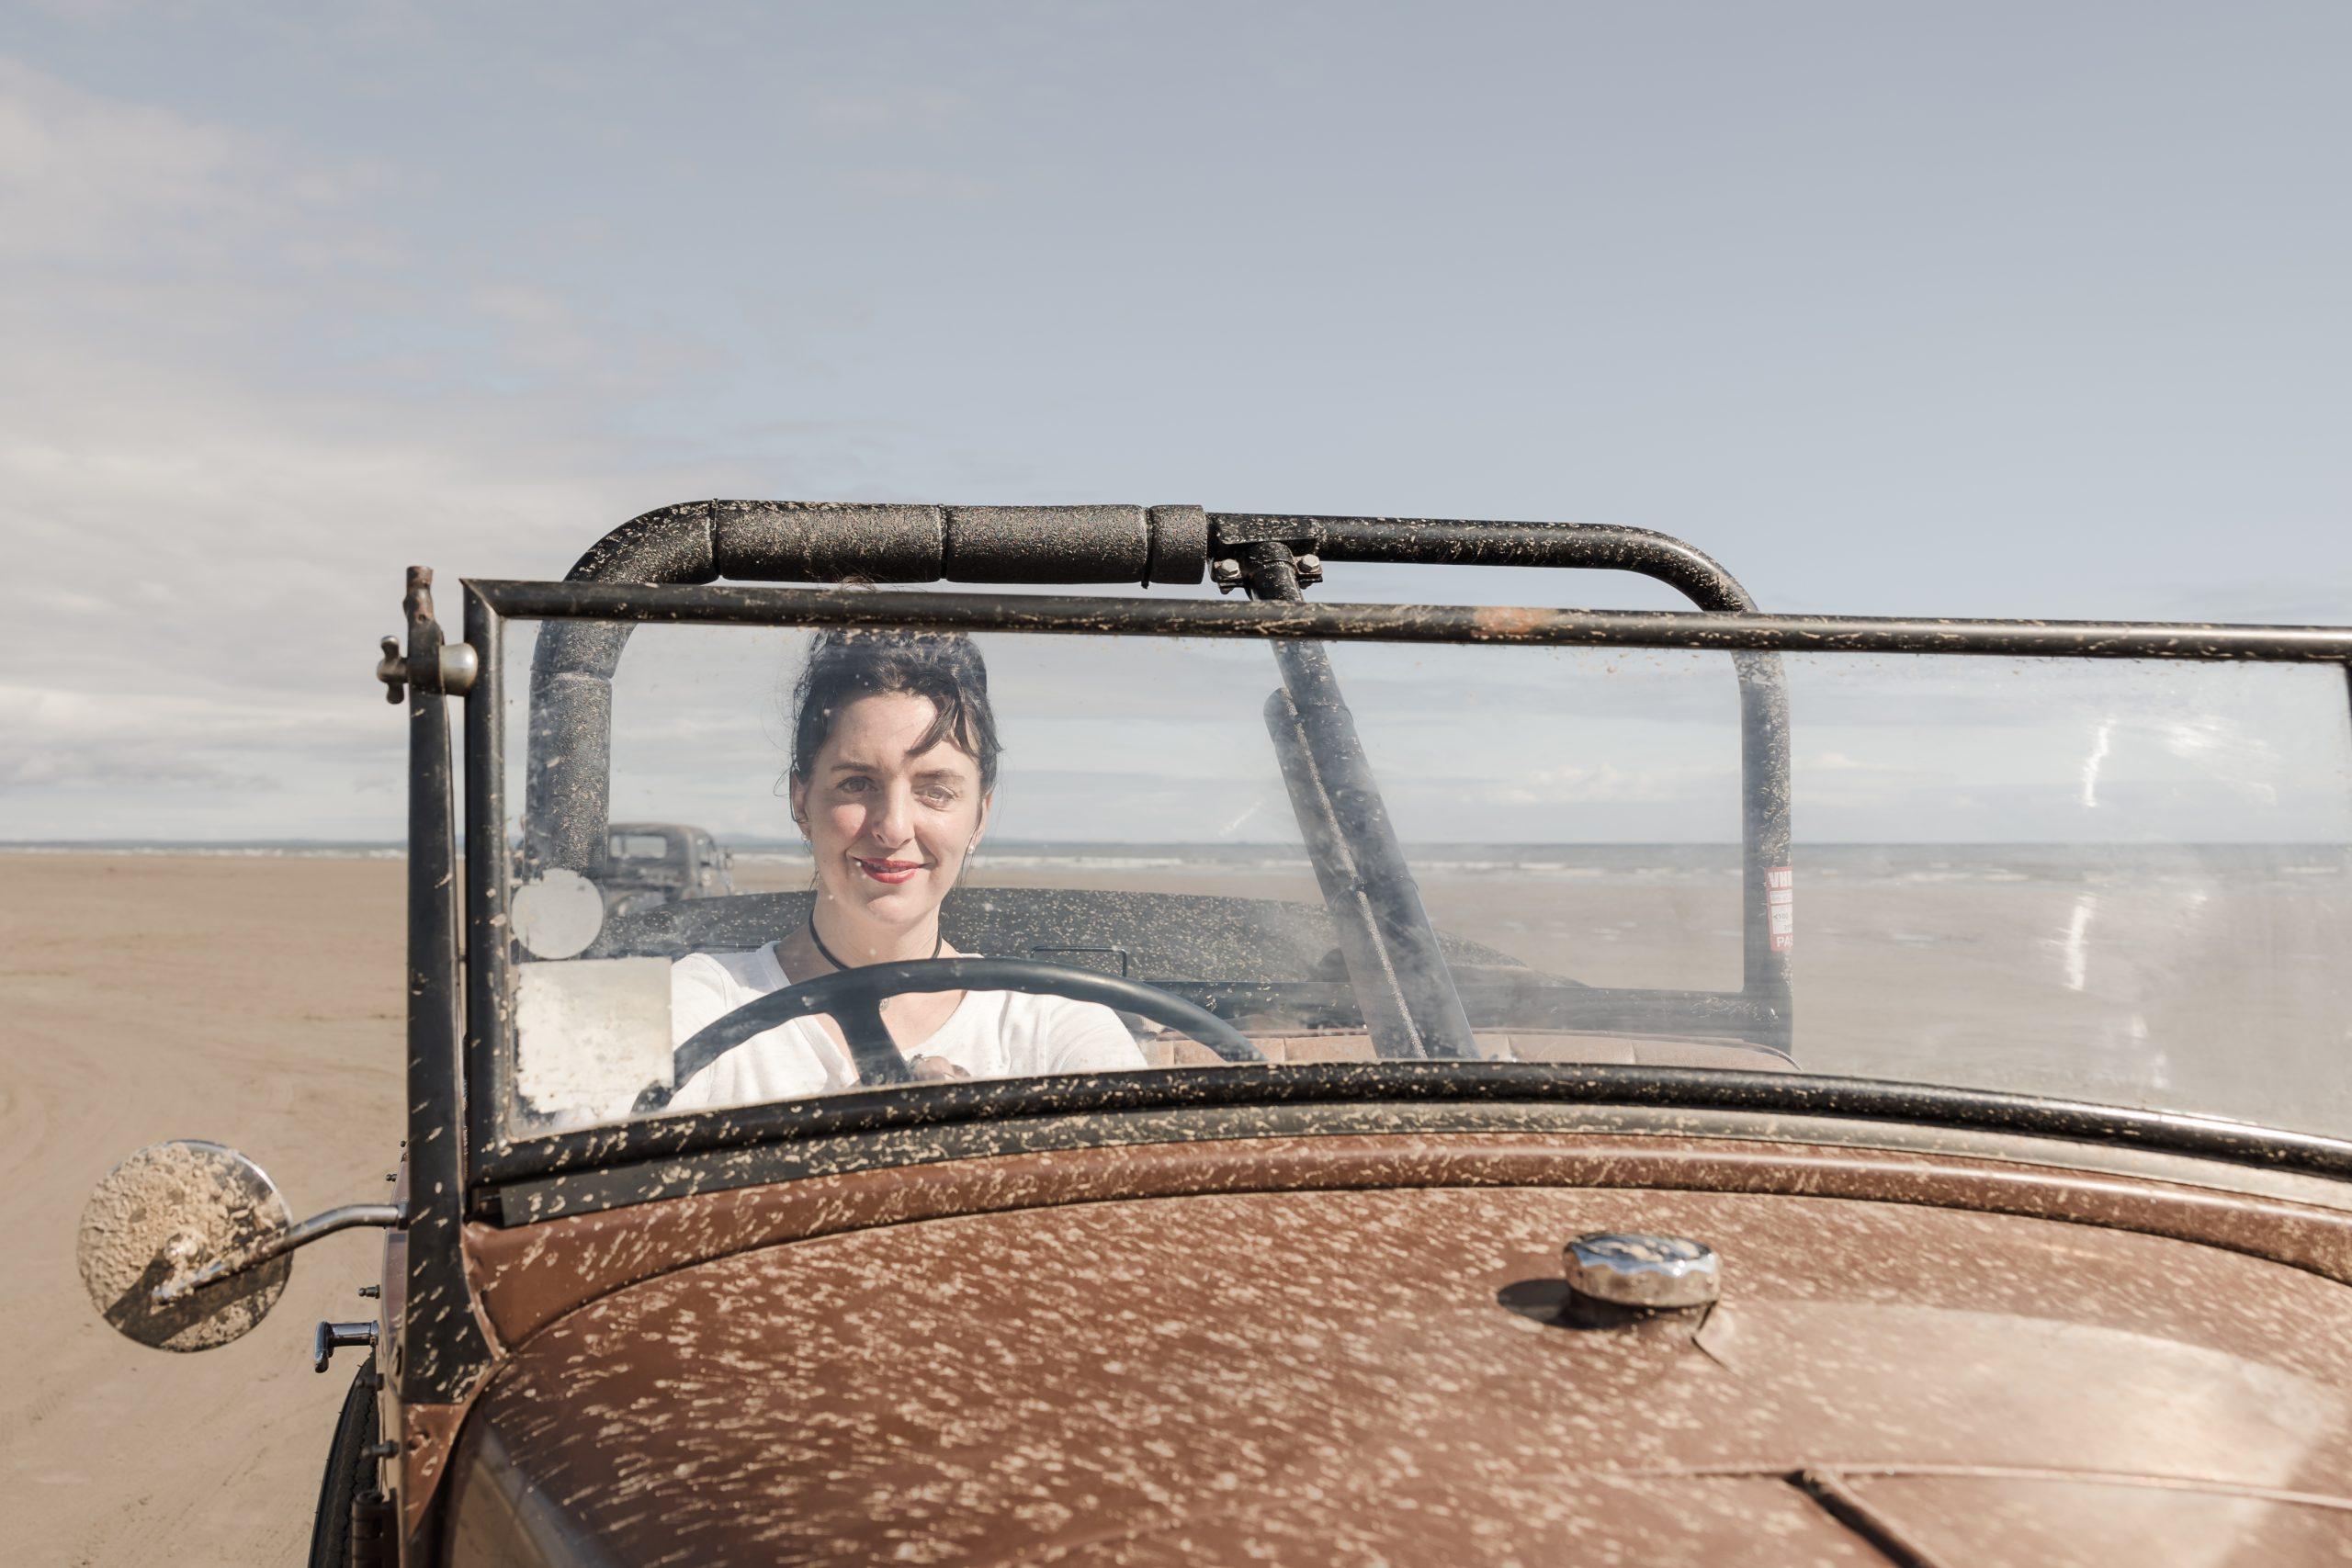 Pendine Sands hot rod racer portrait through windscreen